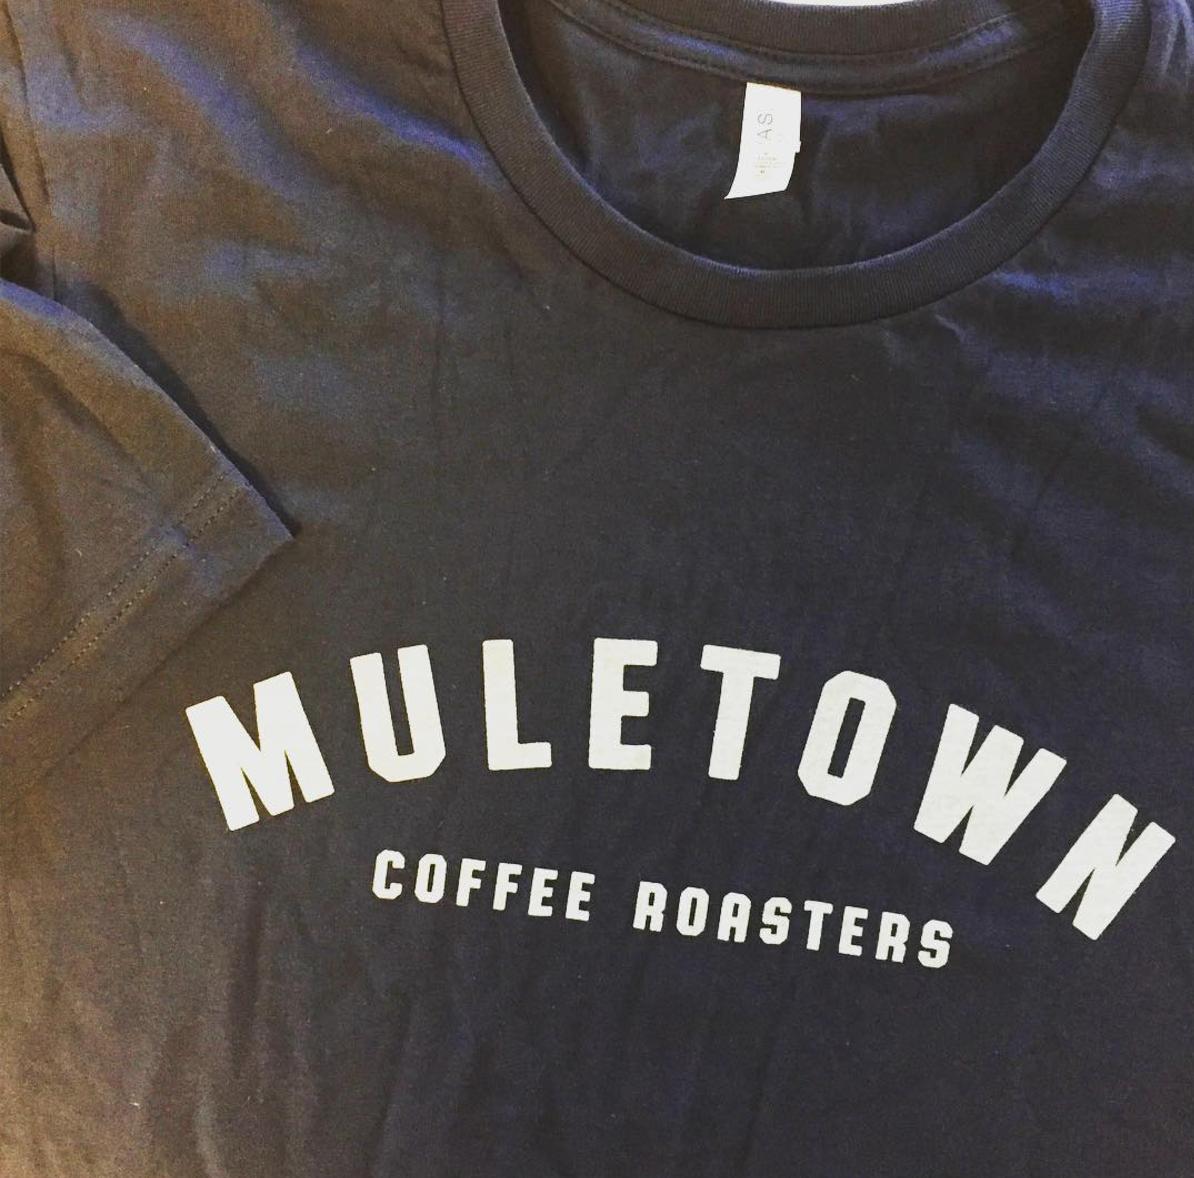 Muletown Coffee Tee design